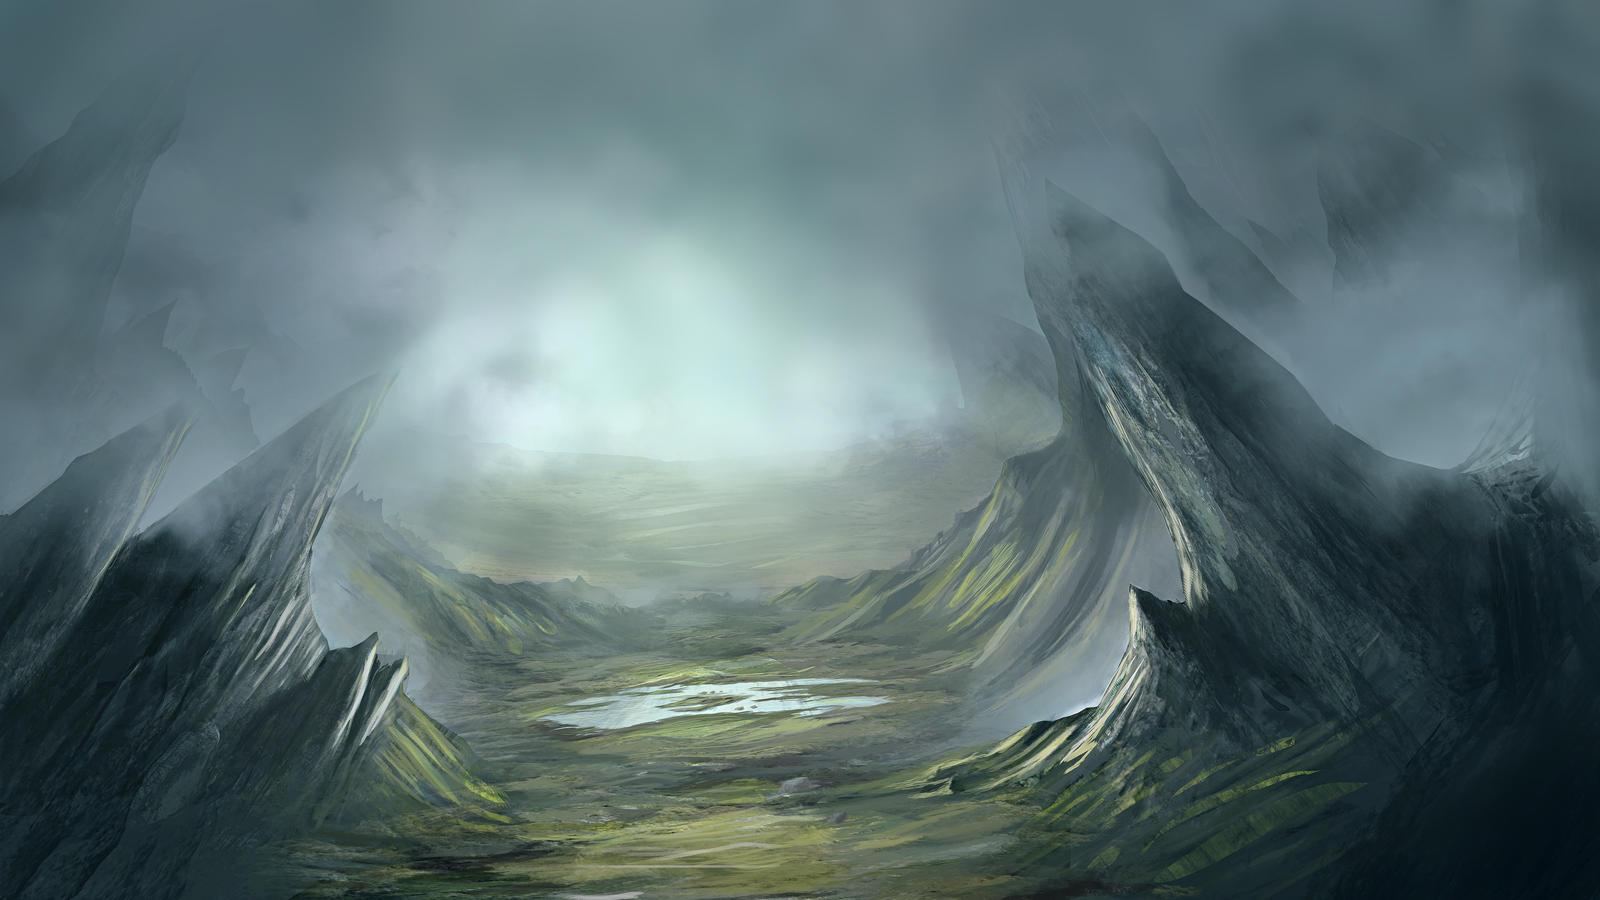 Fantasy Landscape by sjruk